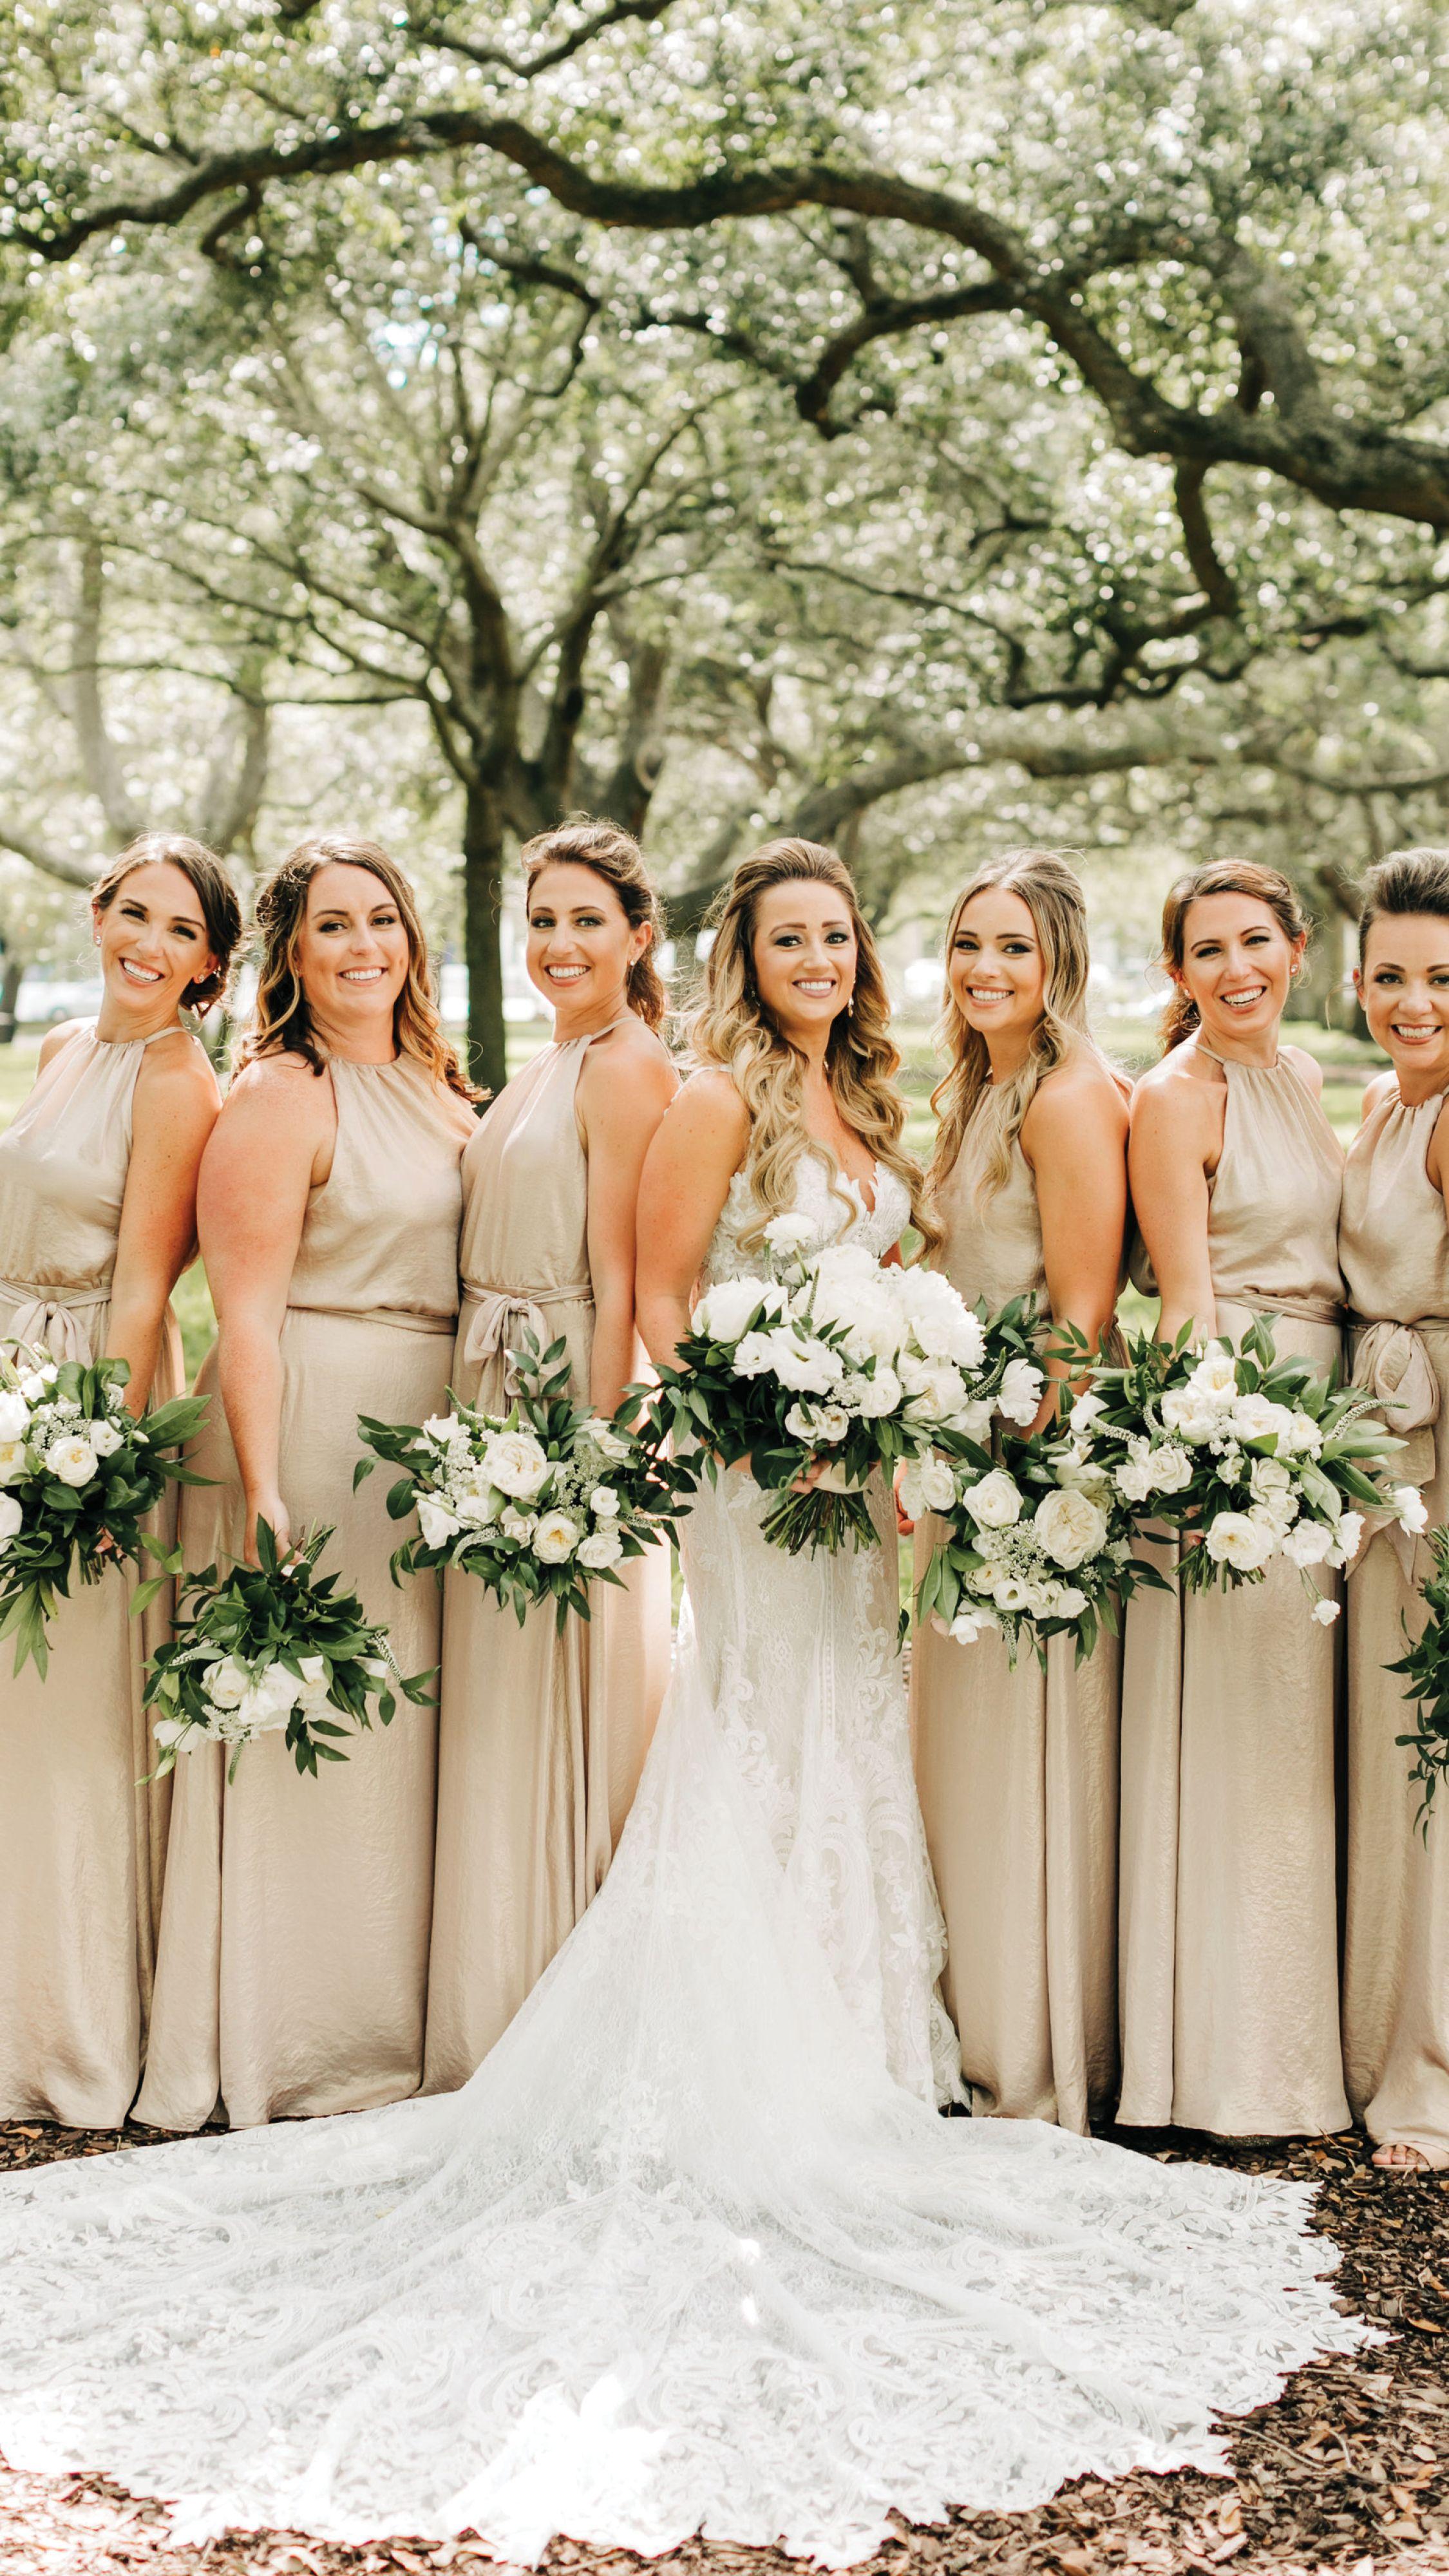 Champagne And Greenery Make This Charleston Wedding Shine Champagne Wedding Colors Castle Wedding Dress Champagne Bridesmaid Dresses [ 4000 x 2250 Pixel ]